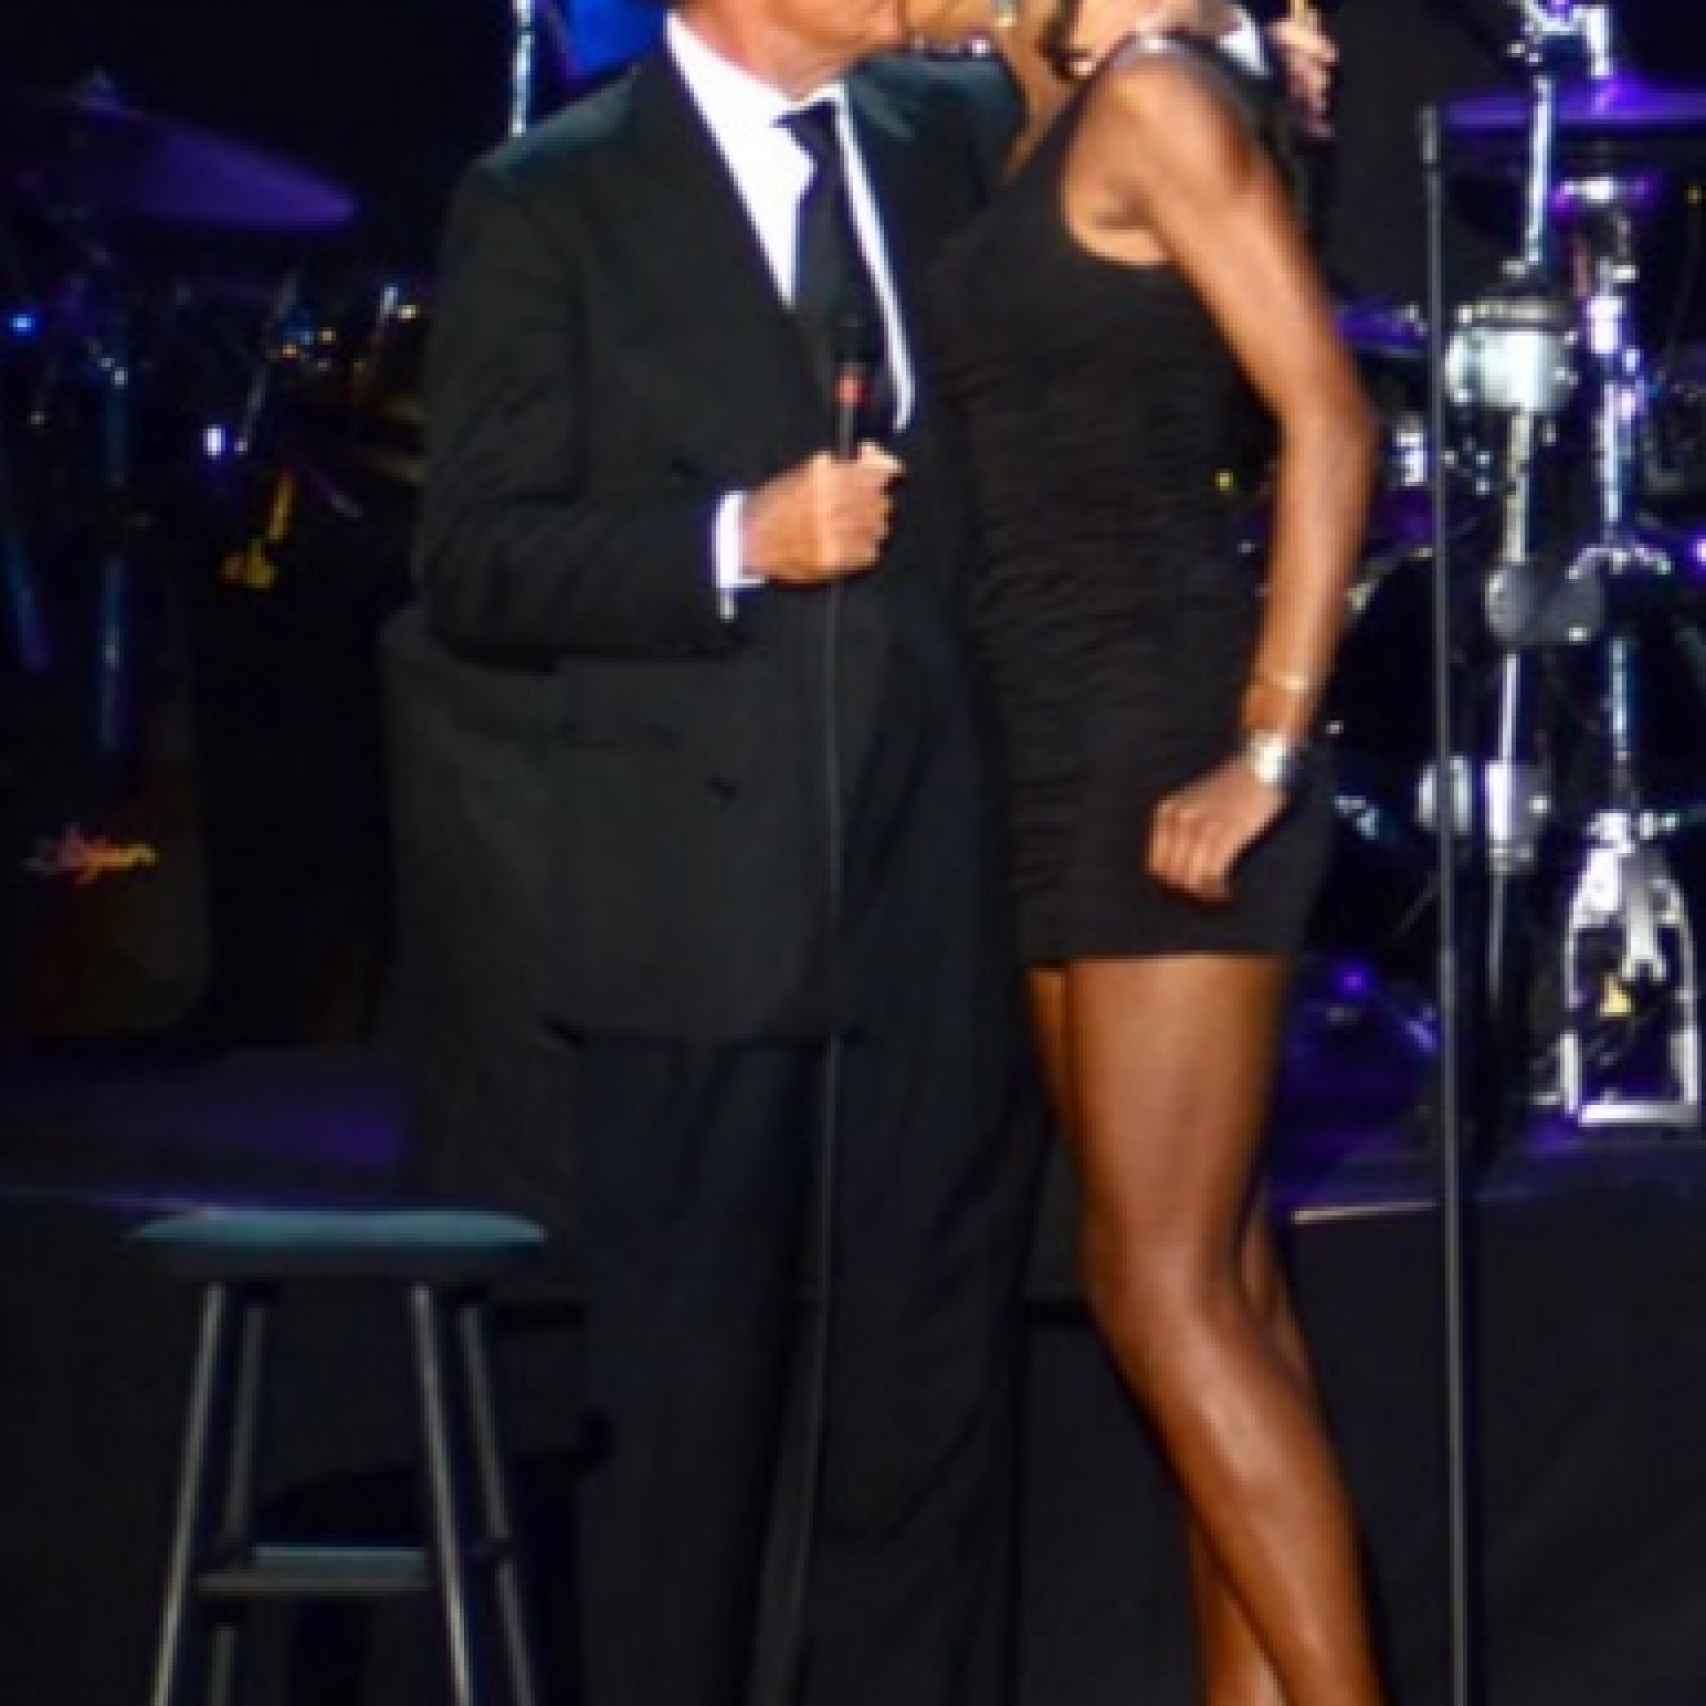 Julio Iglesias besando a una bailarina